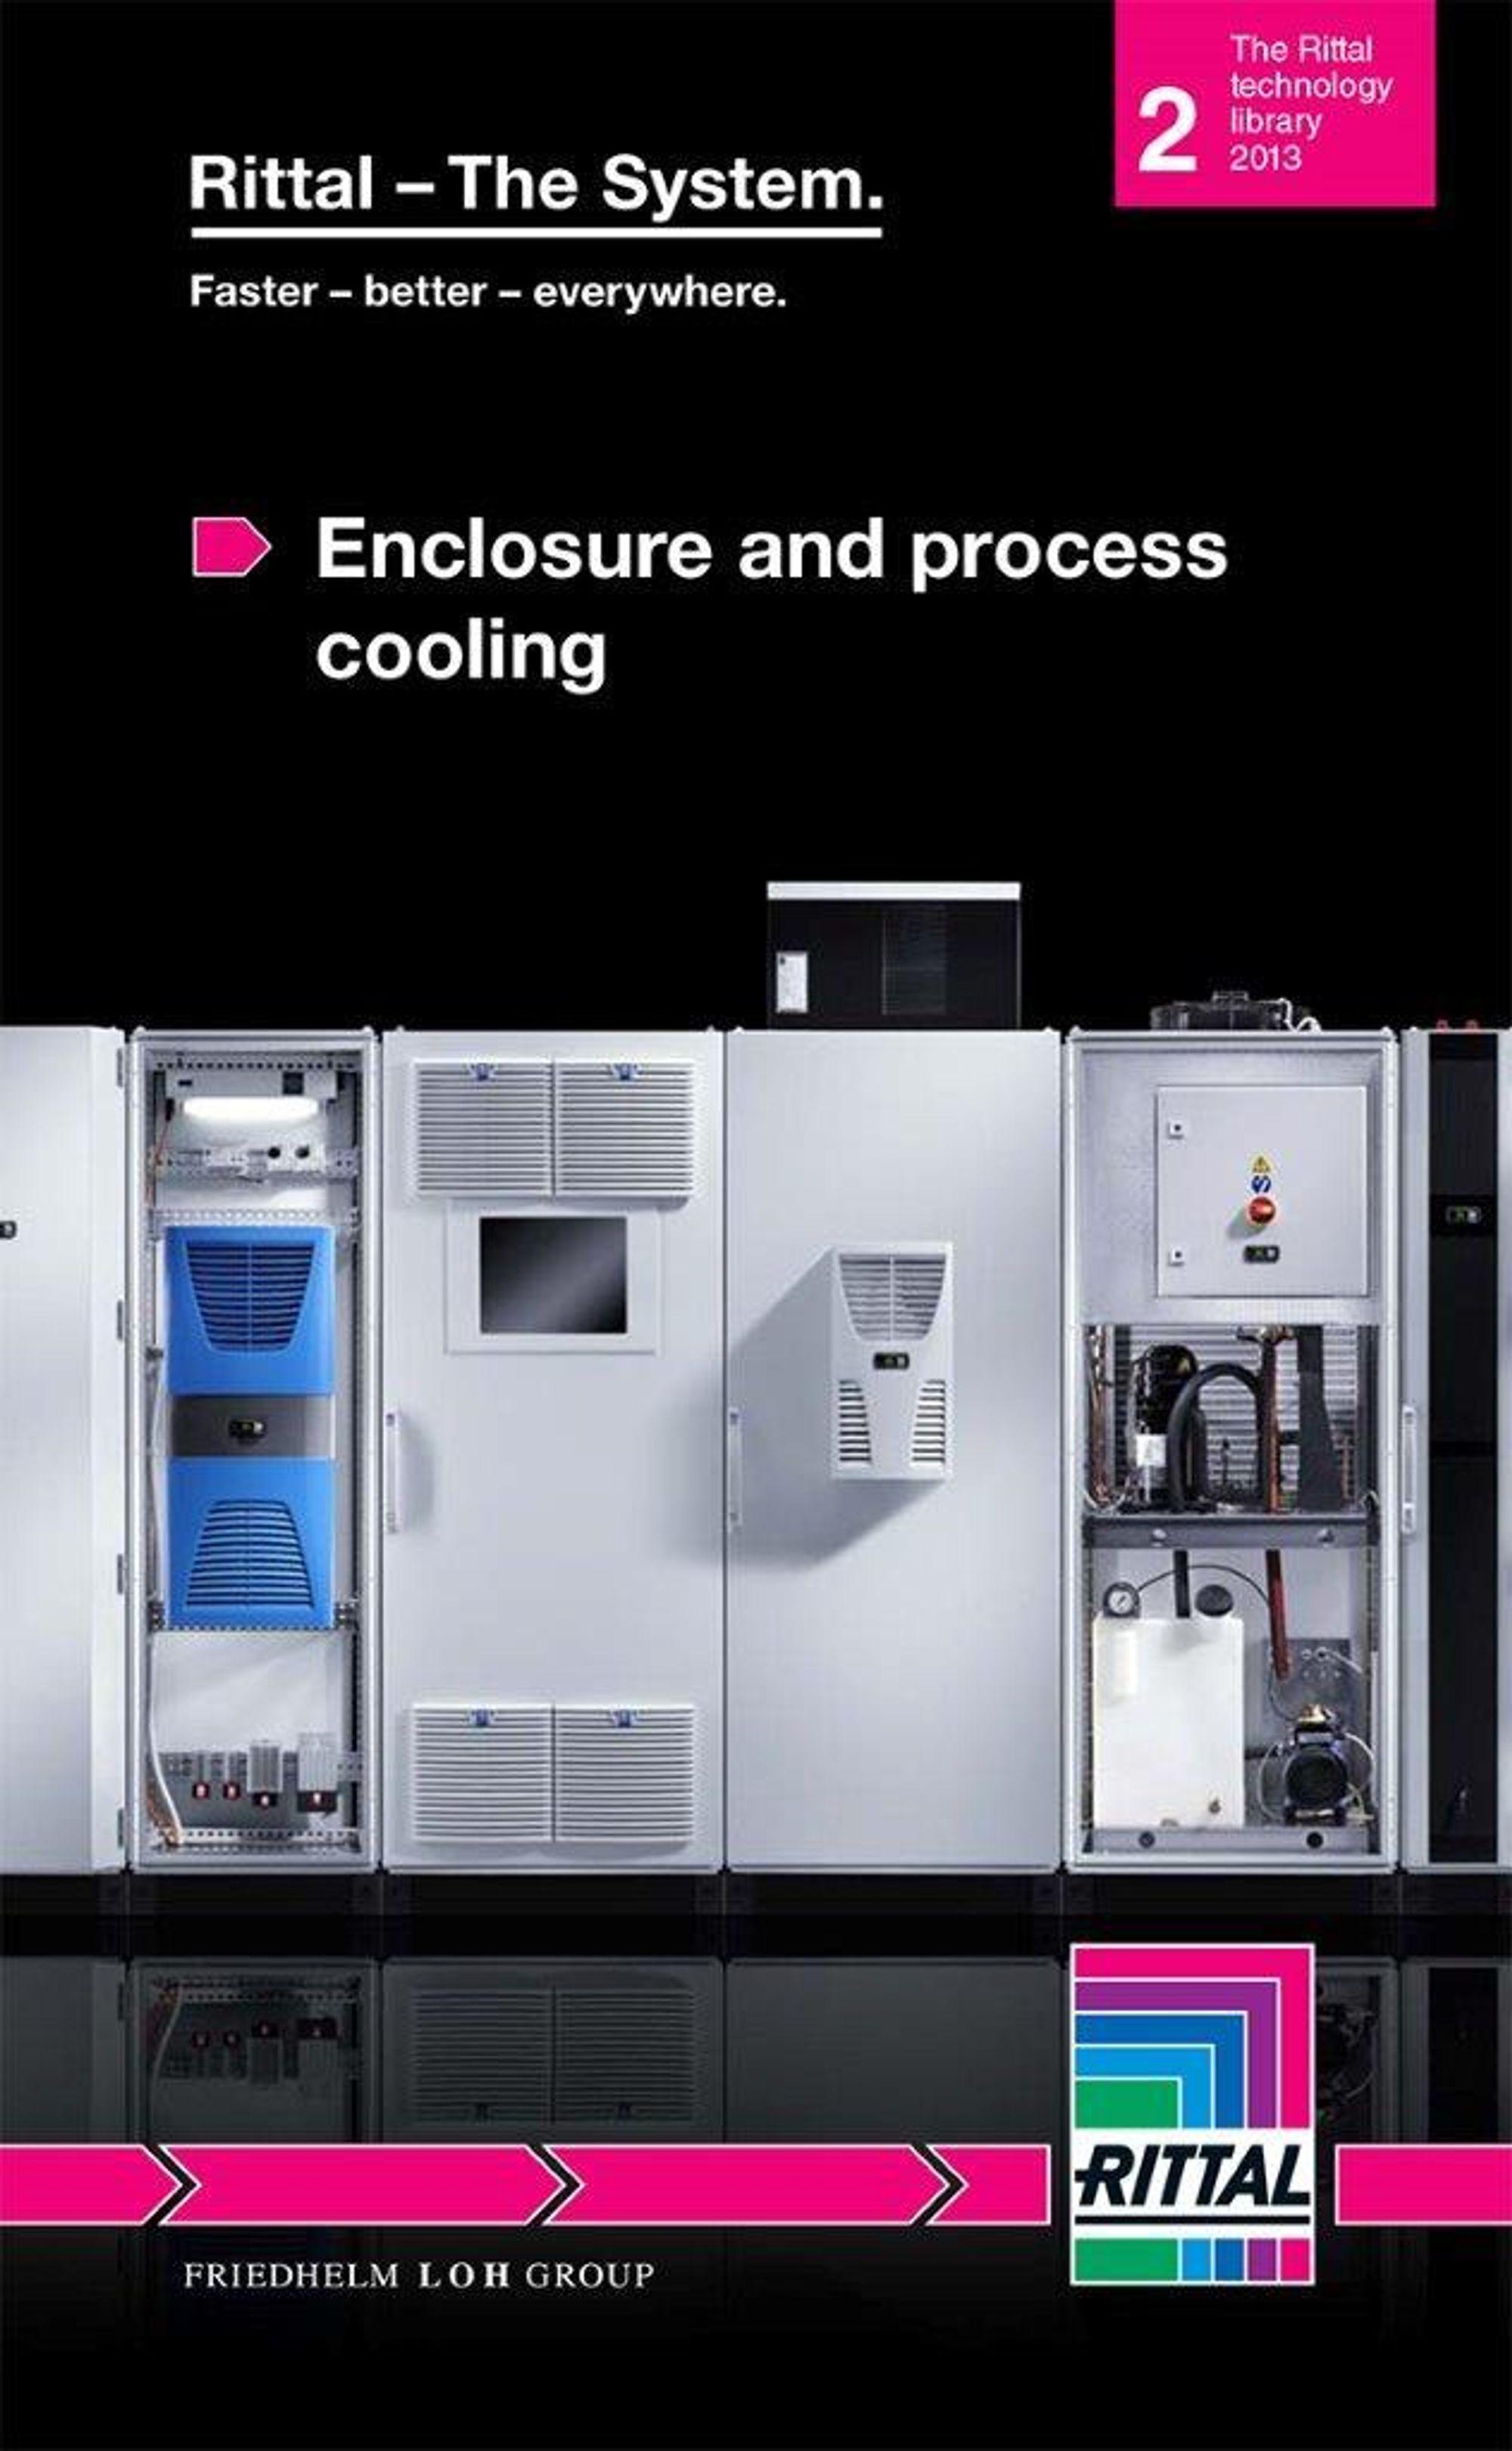 Rittals håndbok om industriell kjøletekninn er på nesten 100 sider.